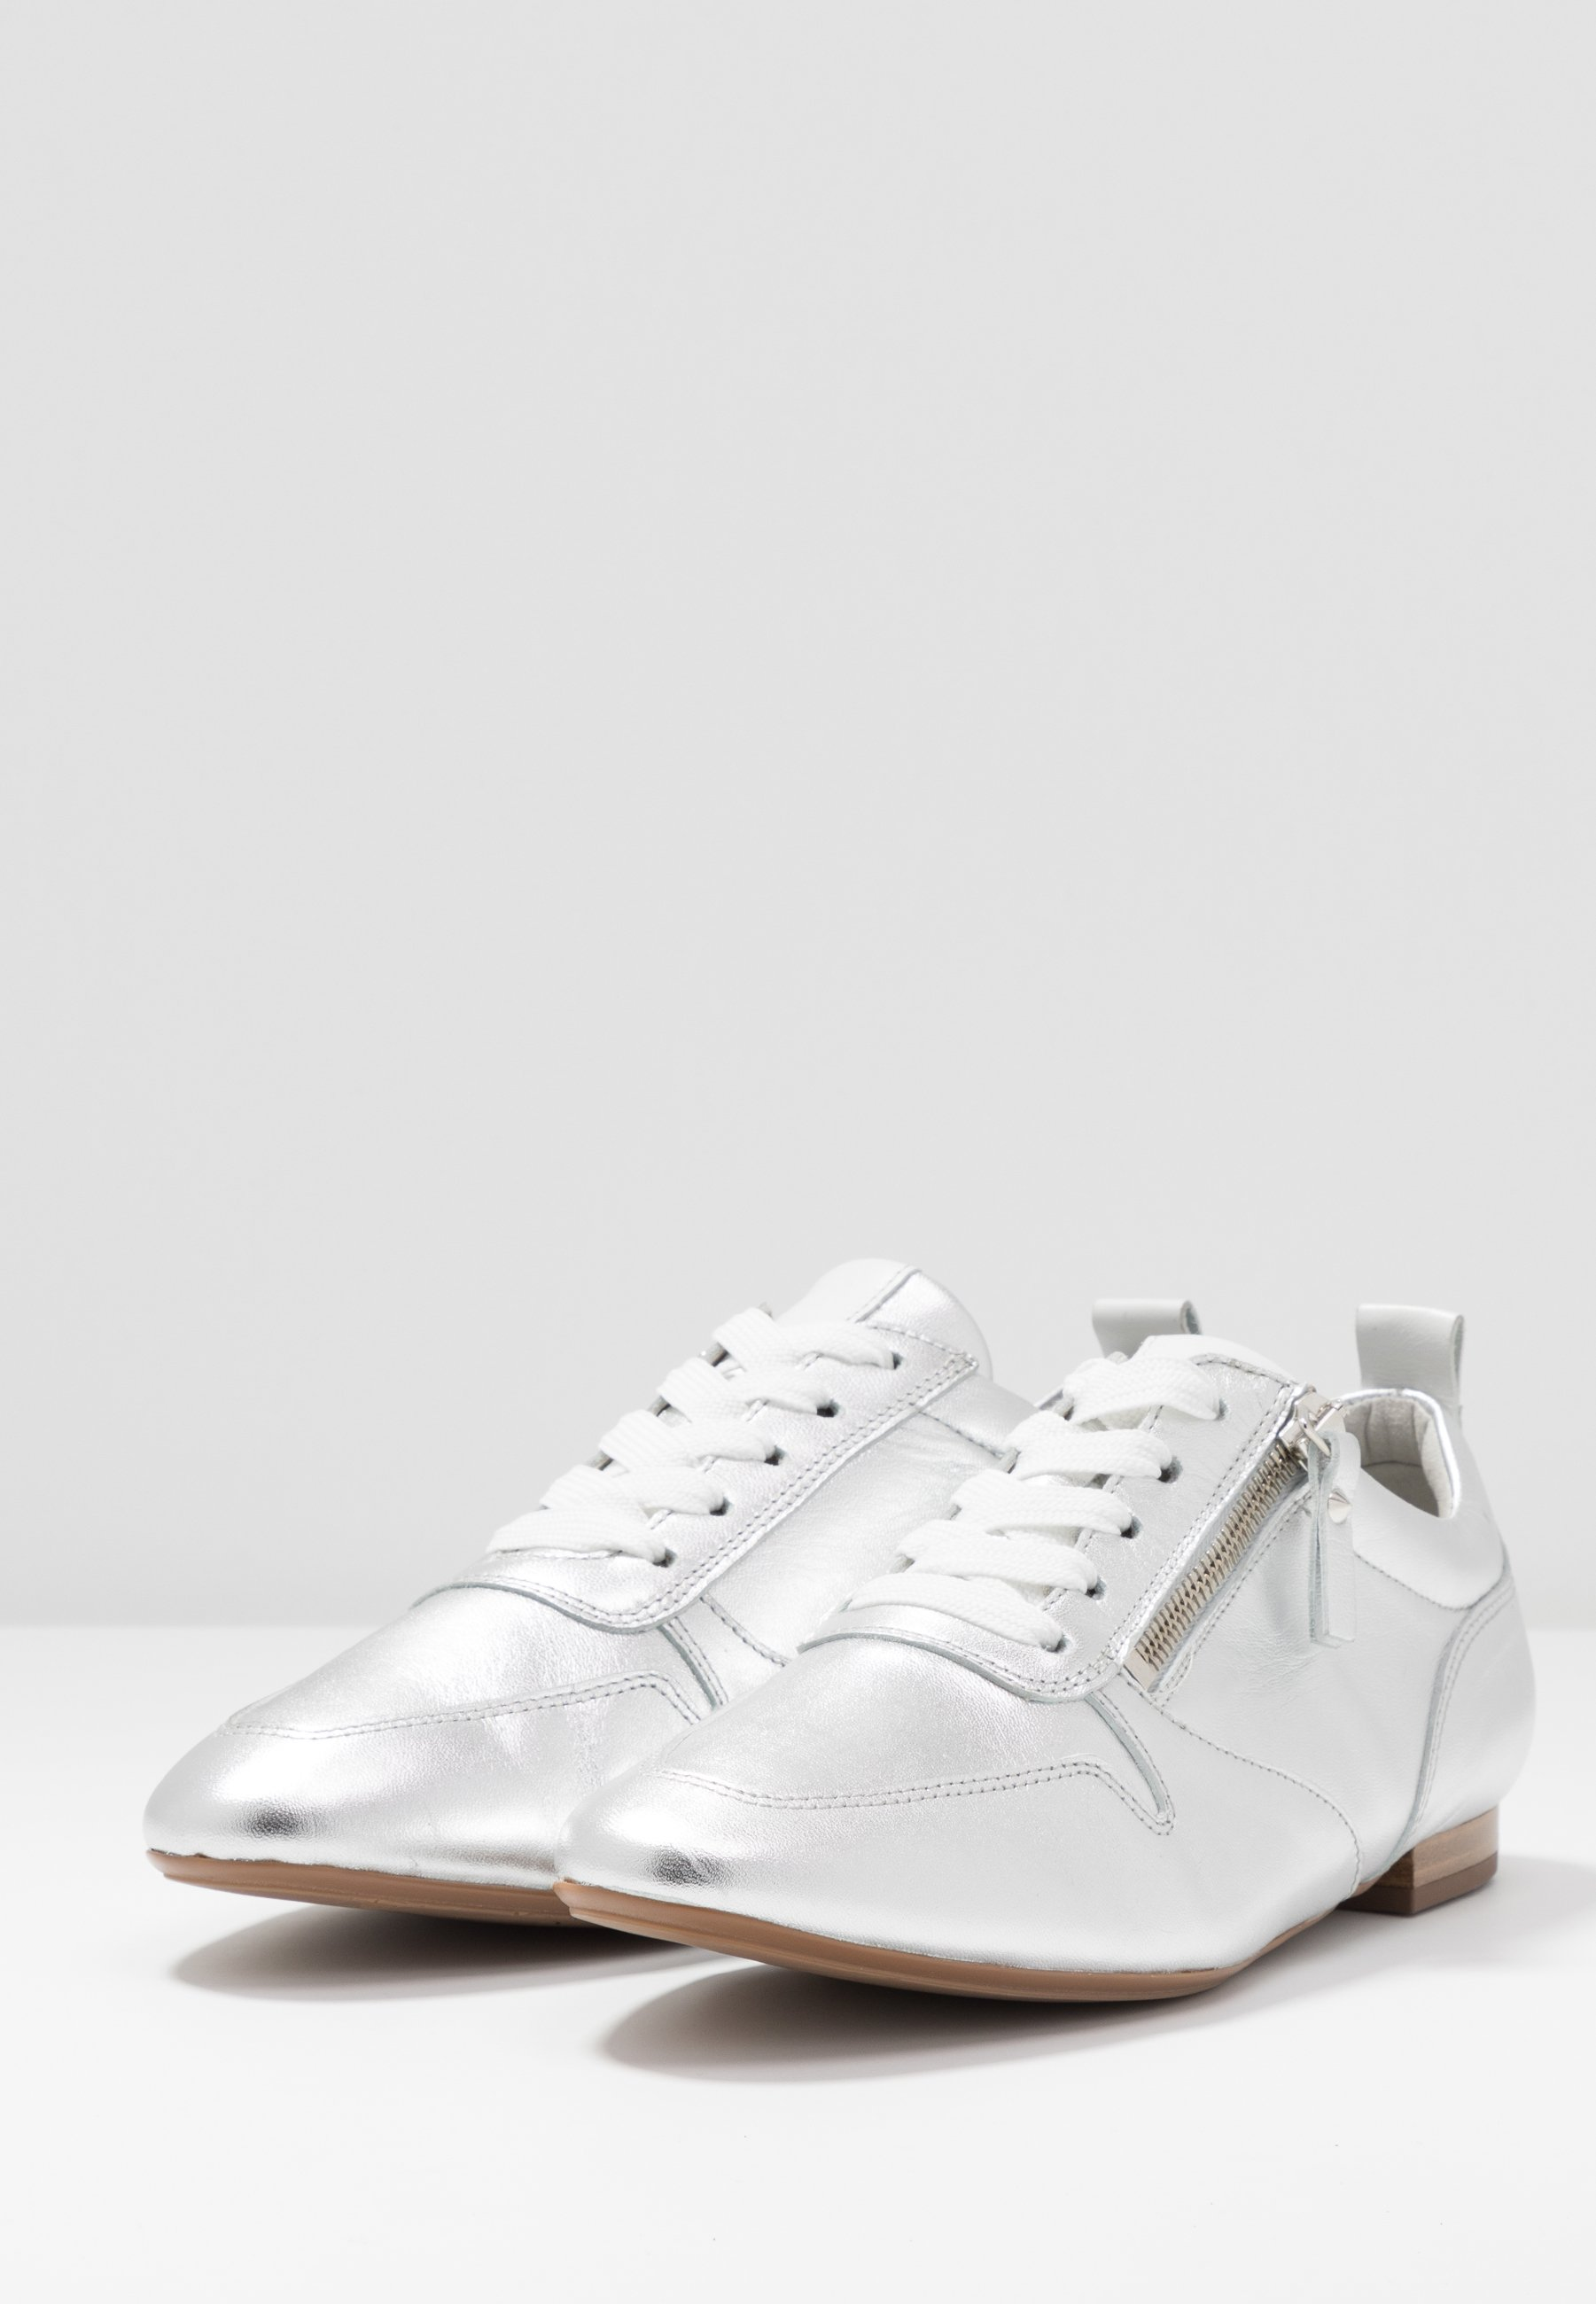 Shop Cheapest Peter Kaiser GINETT - Lace-ups - silber corfu/weiß samoa   women's shoes 2020 hlA3M